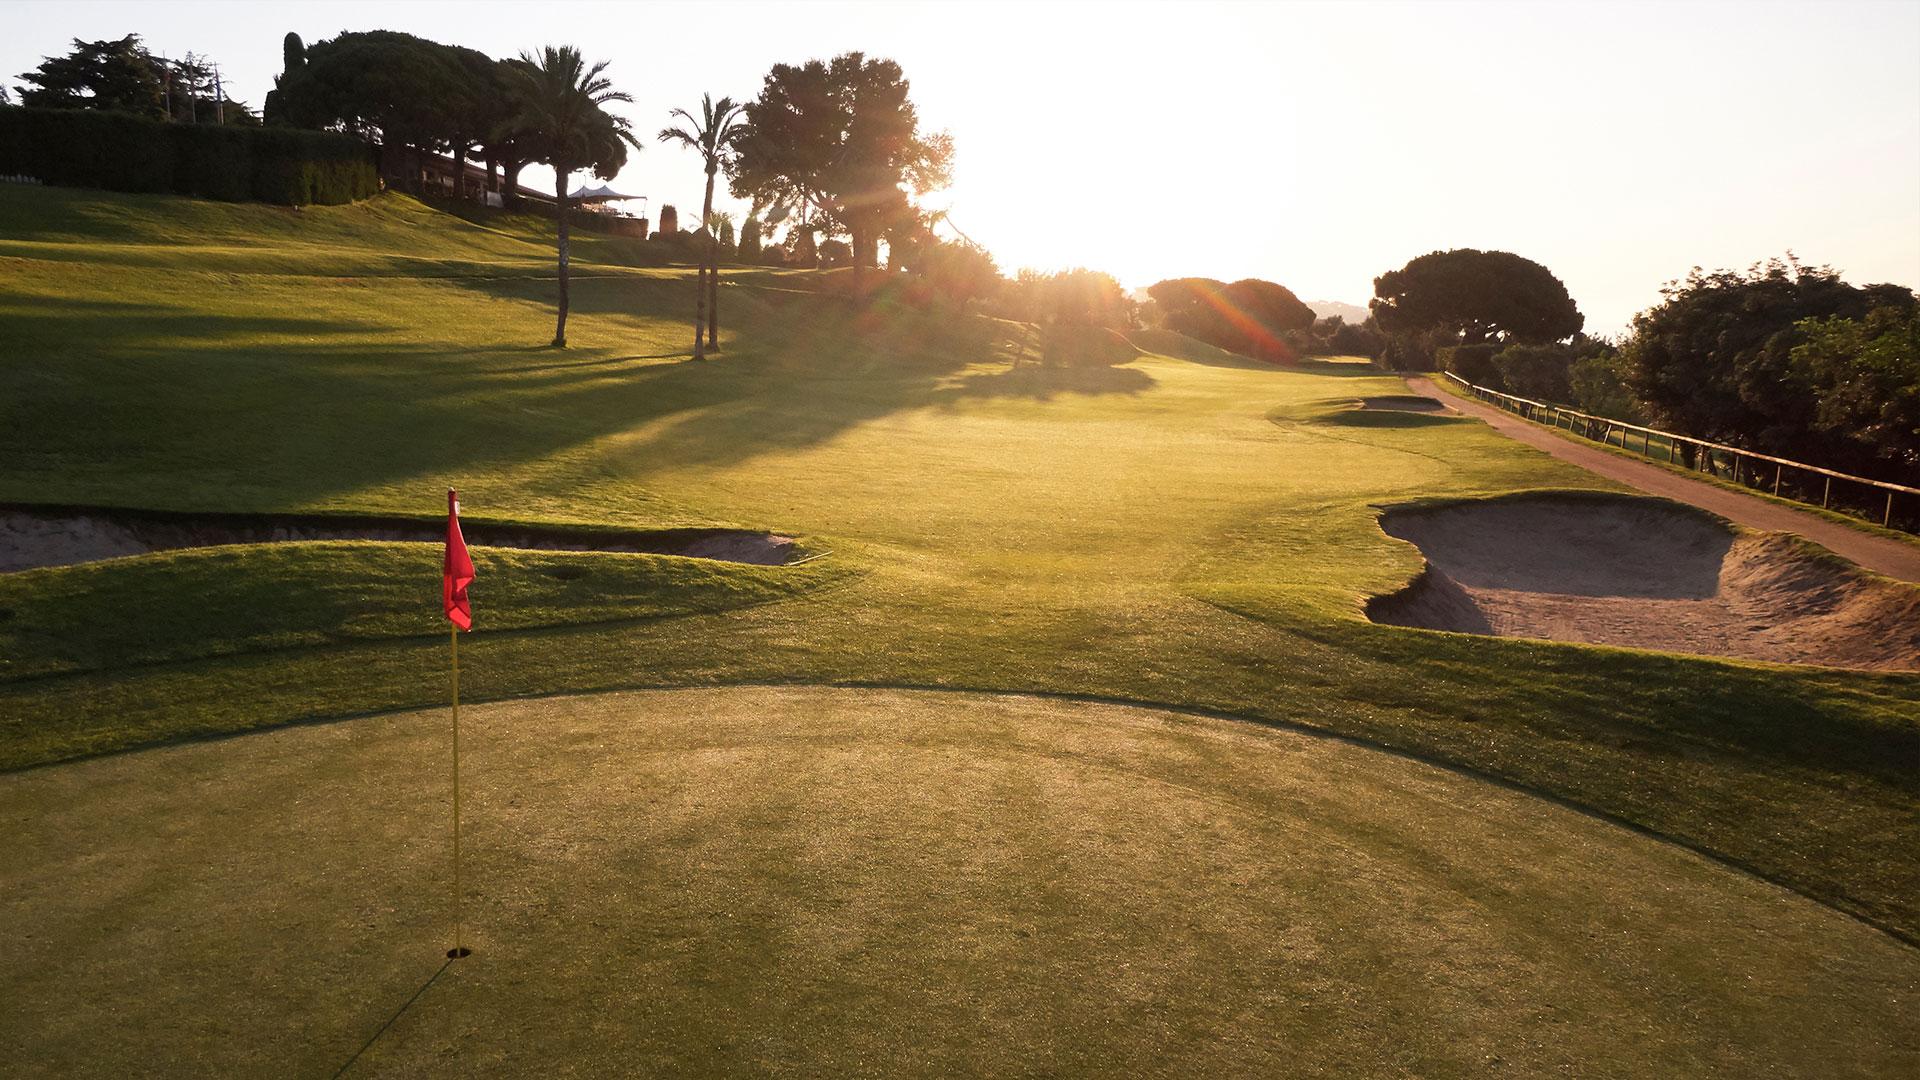 campo de golf llavaneras bunkers atardecer